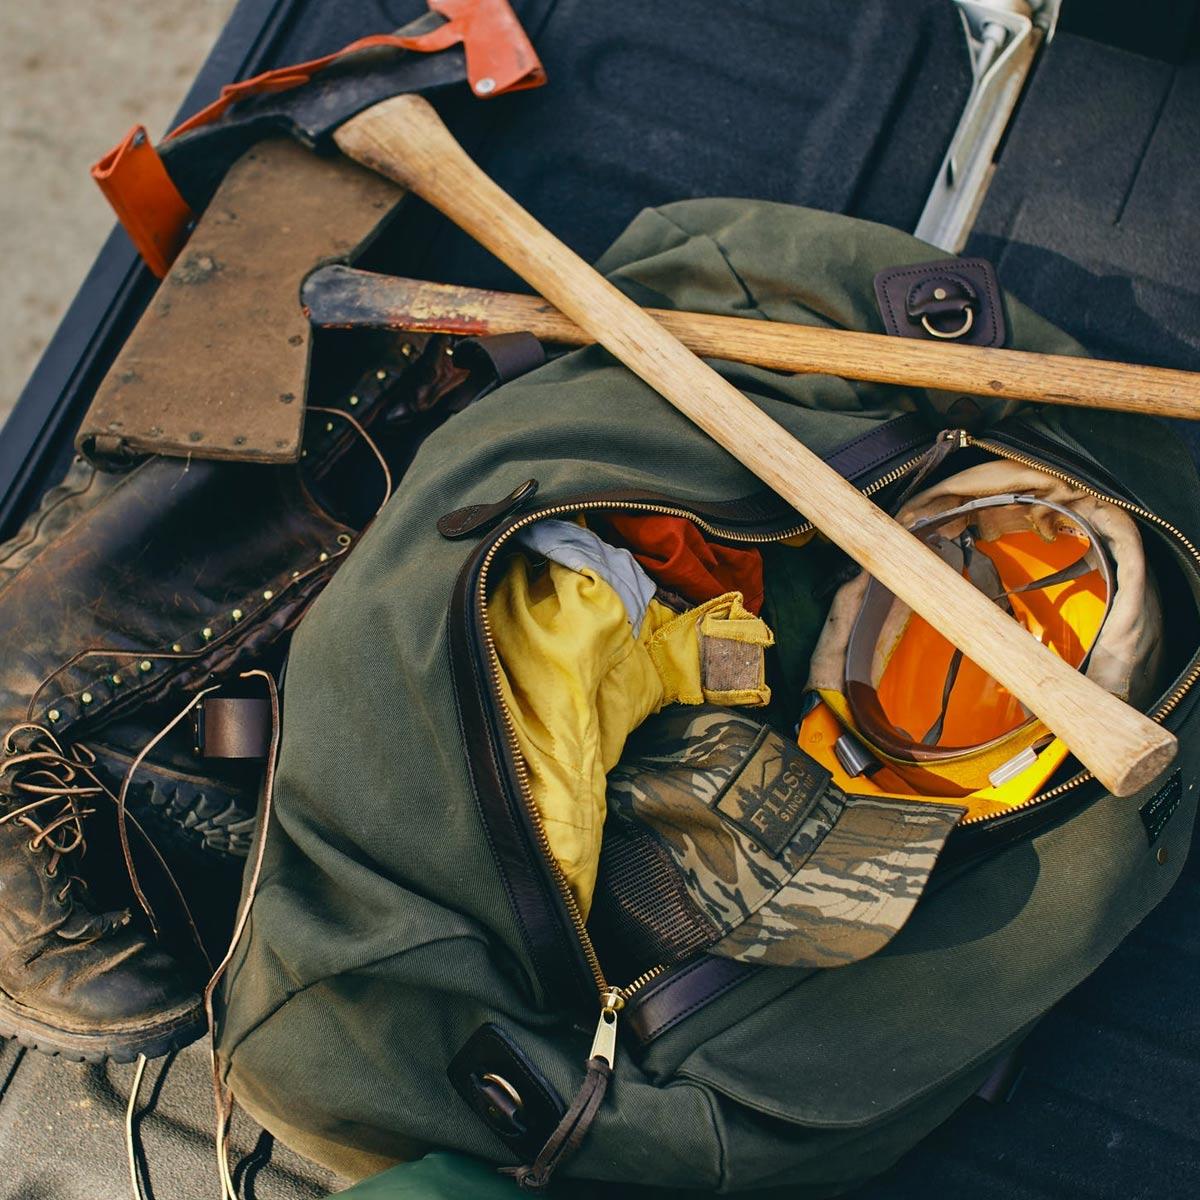 Filson Duffle Medium Otter Green, travelbag made for heavy-duty trips